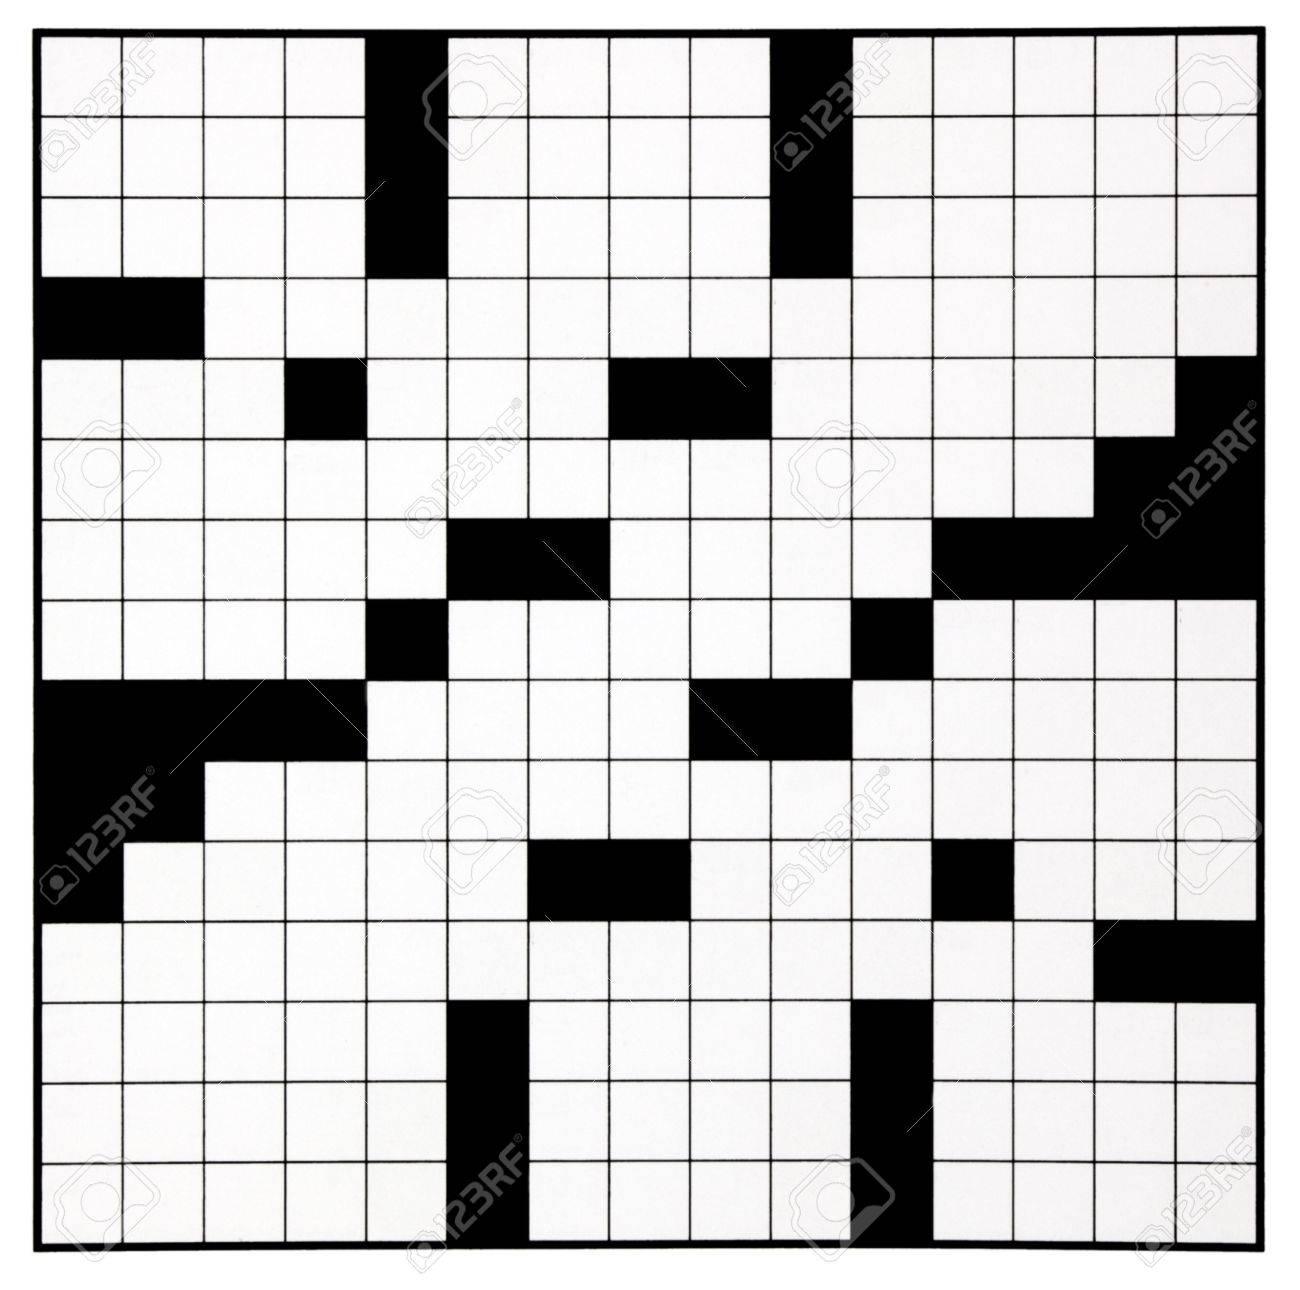 Blank Crossword Puzzle Grid - Karis.sticken.co - Blank Crossword Puzzle Grids Printable